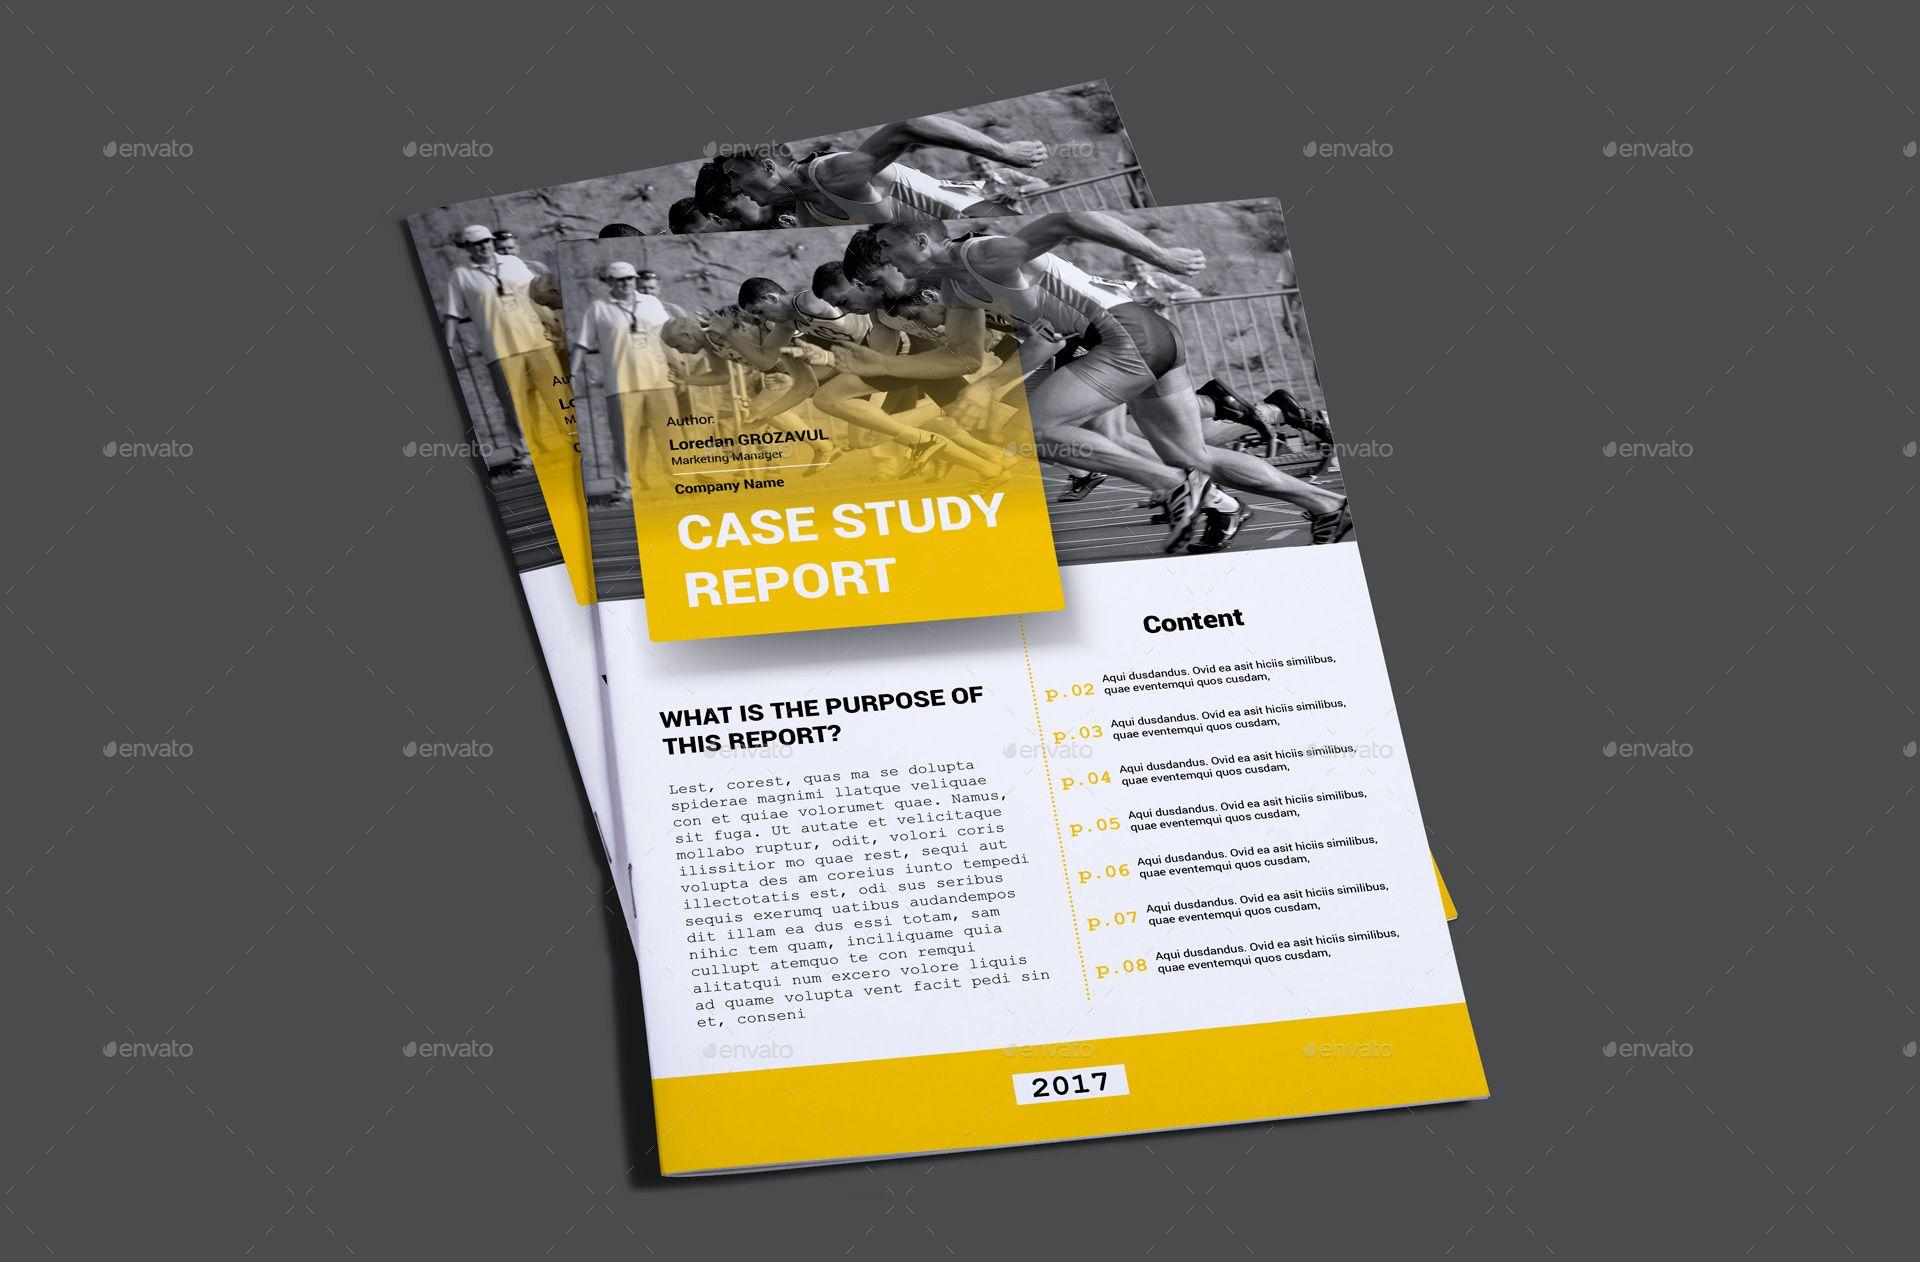 Case Study Report Template | Pinterest